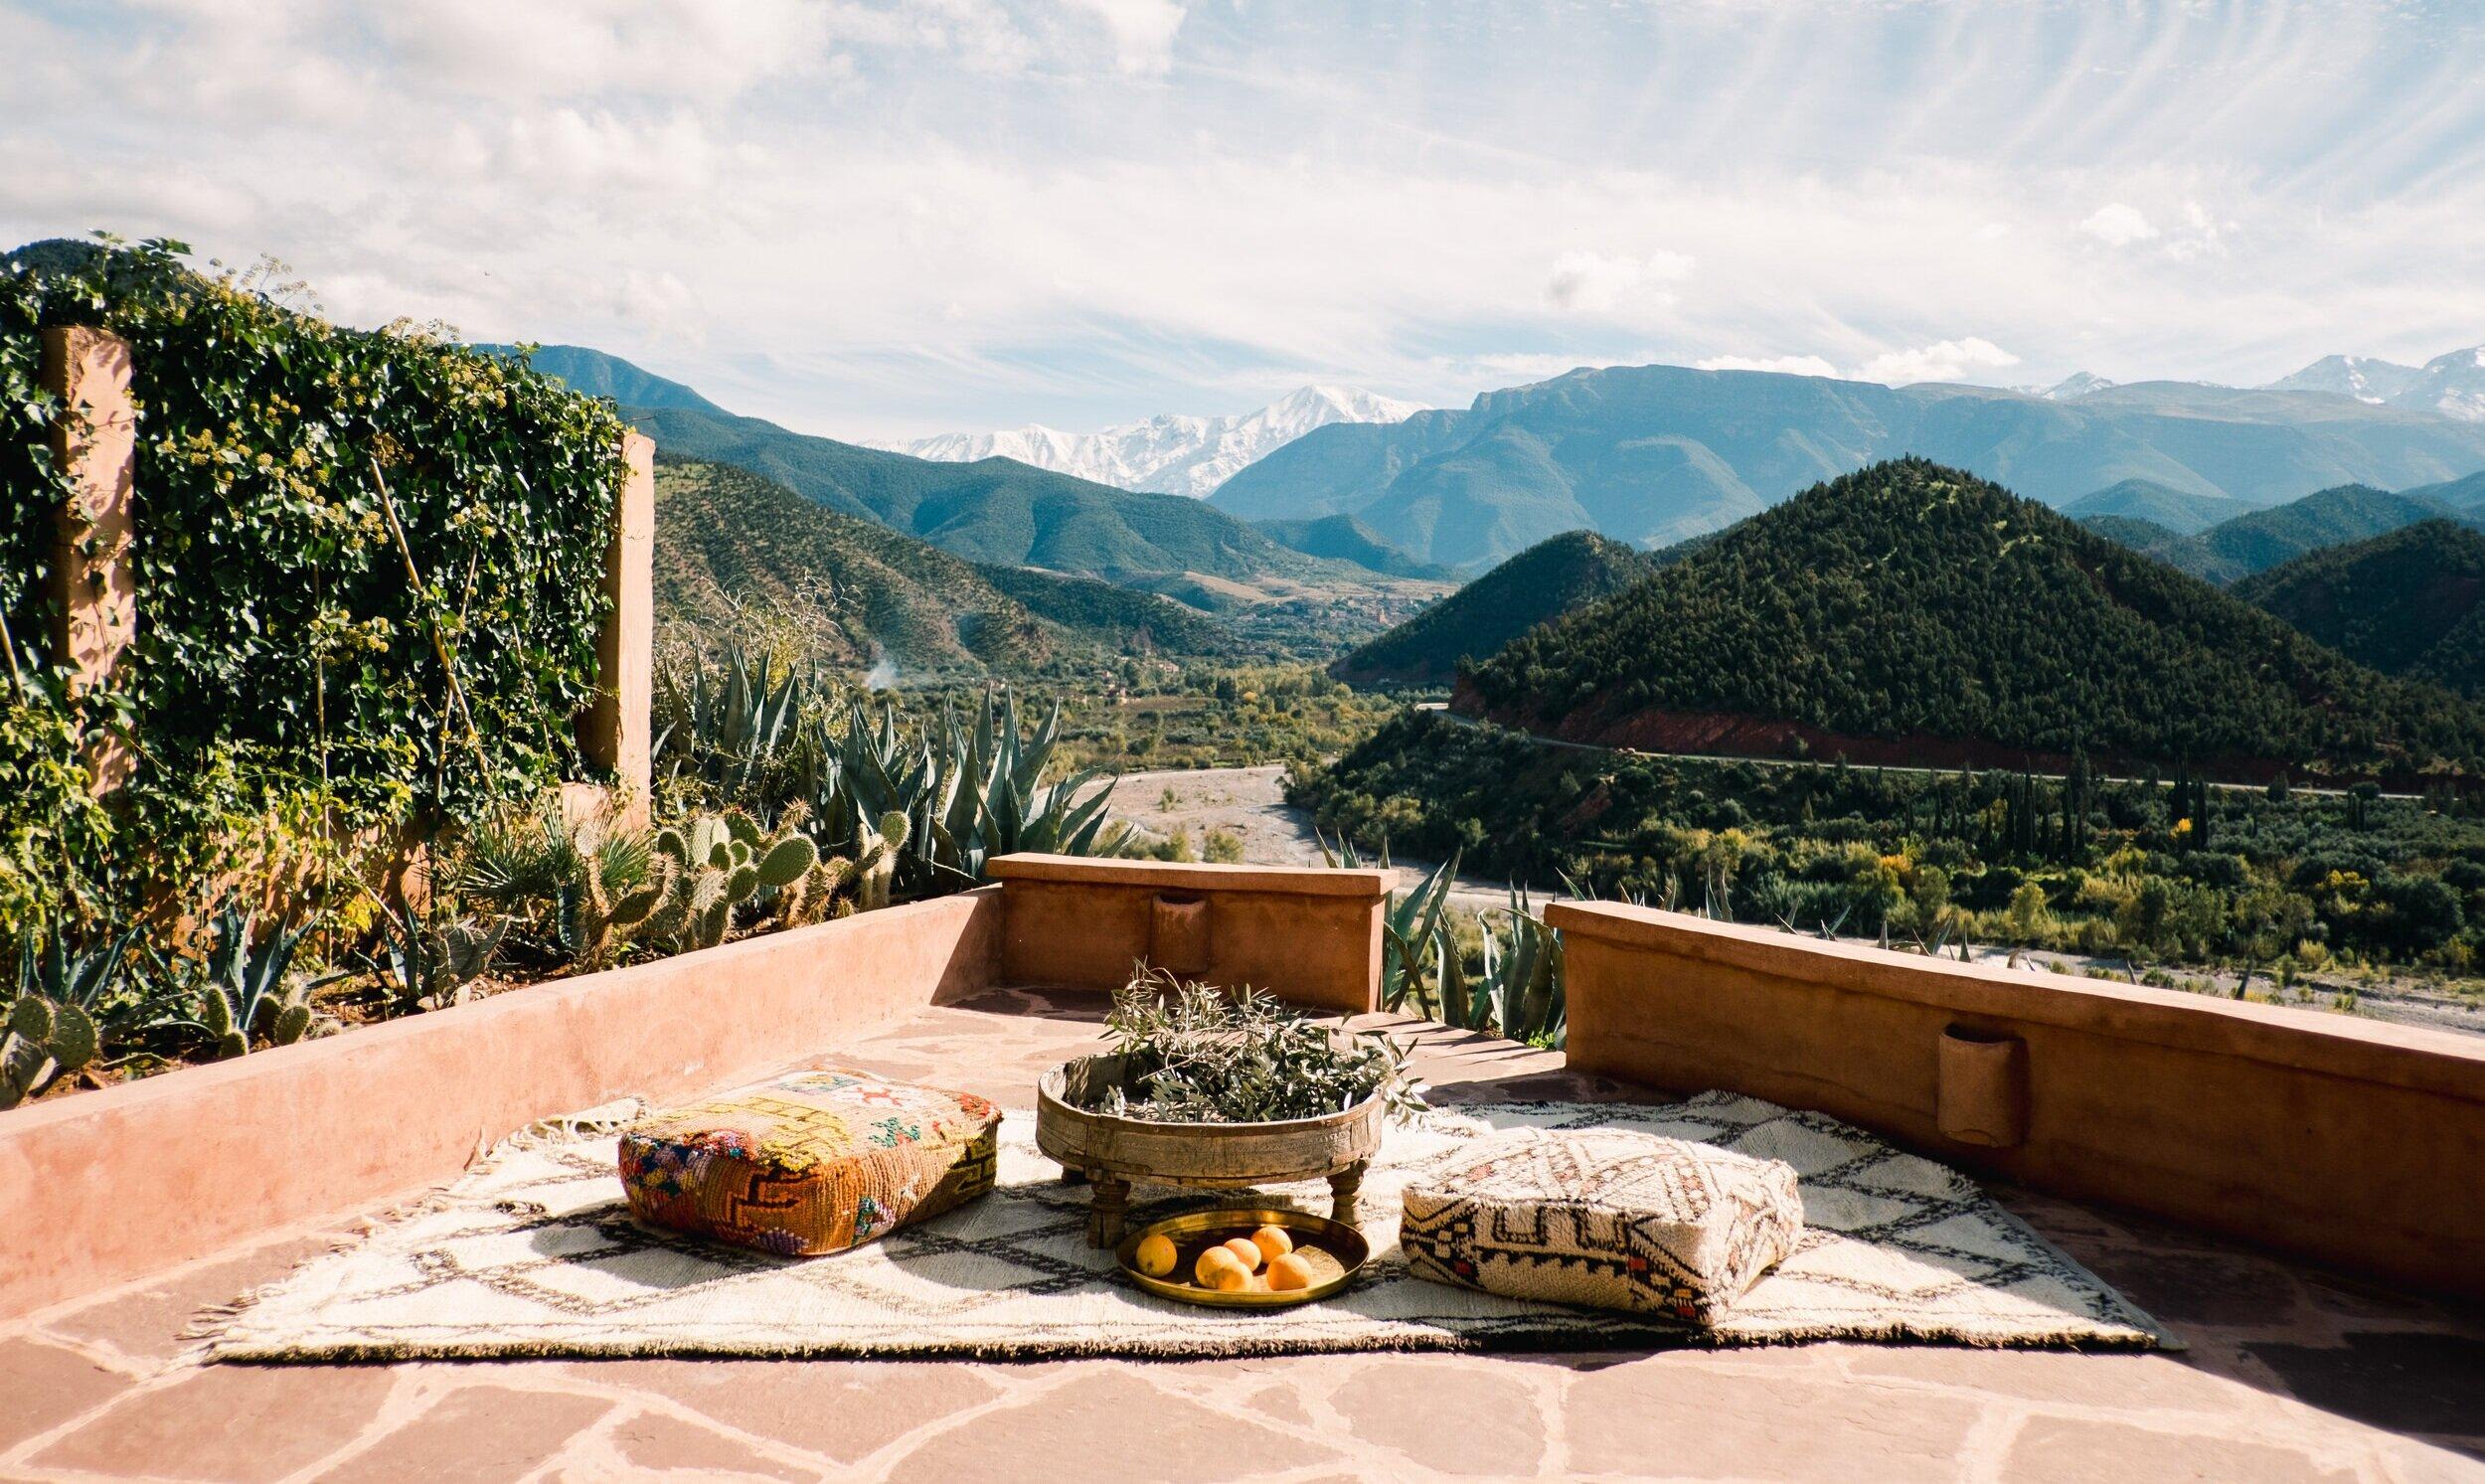 - Morocco